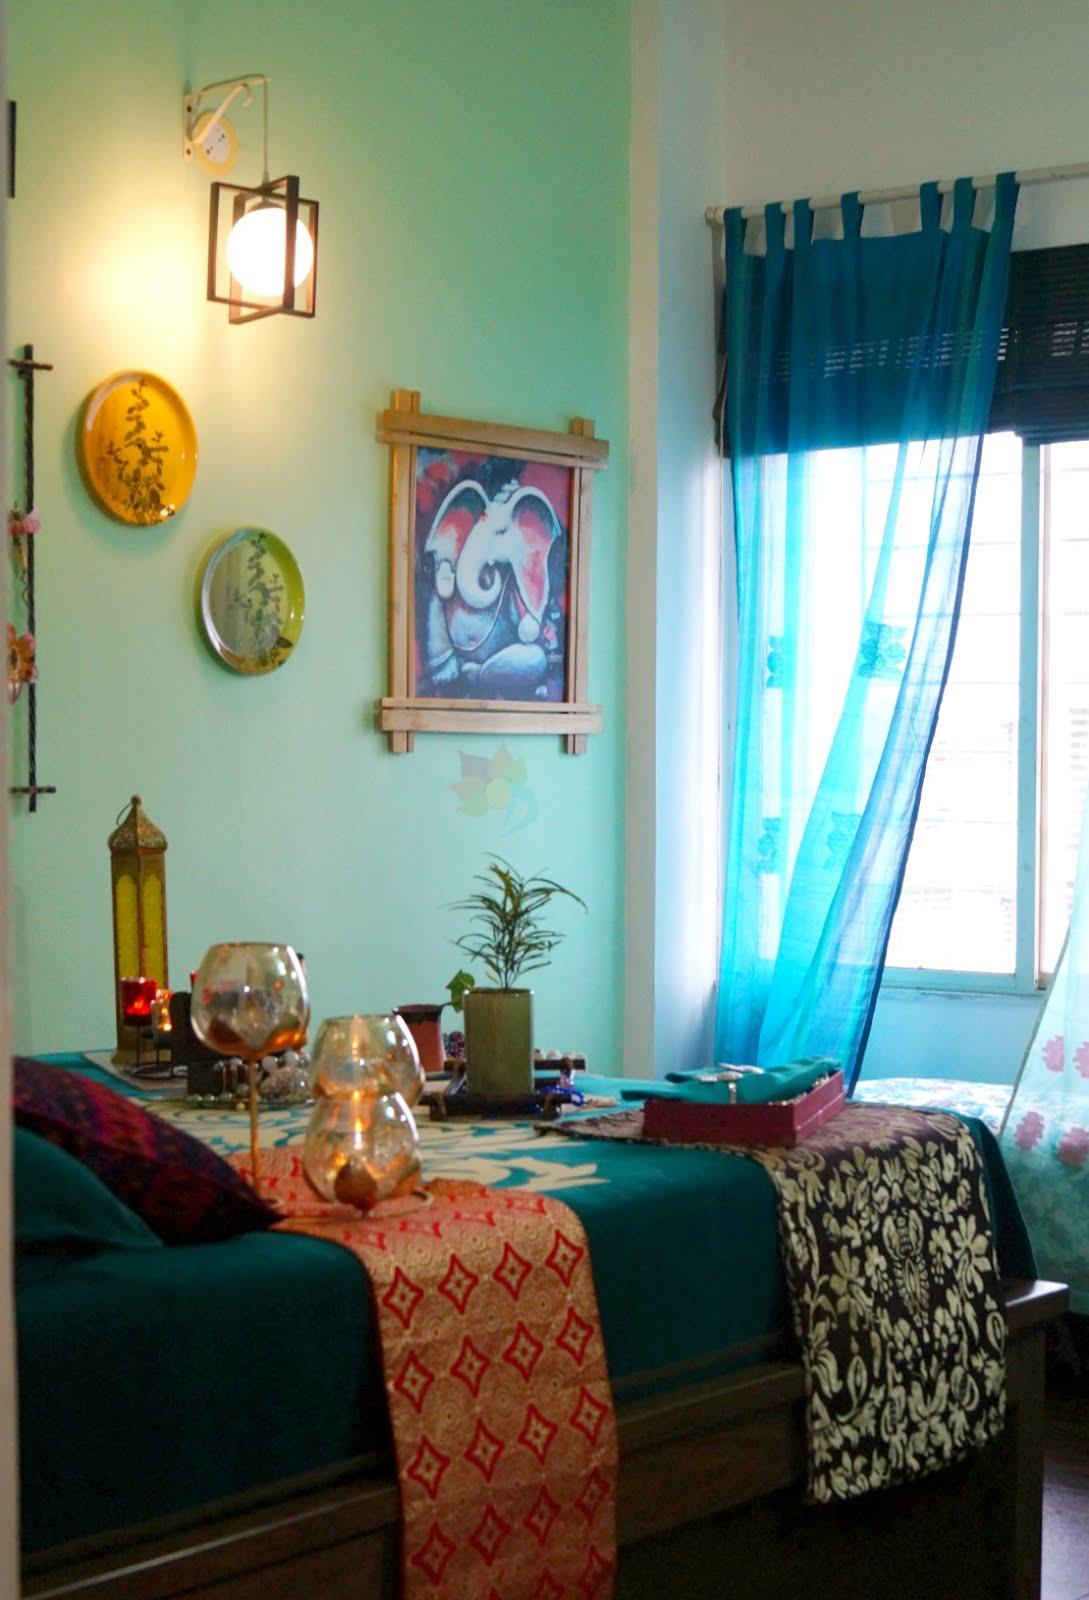 Design Decor Disha An Indian Design Decor Blog Home Tour Anushikha Dwivedi